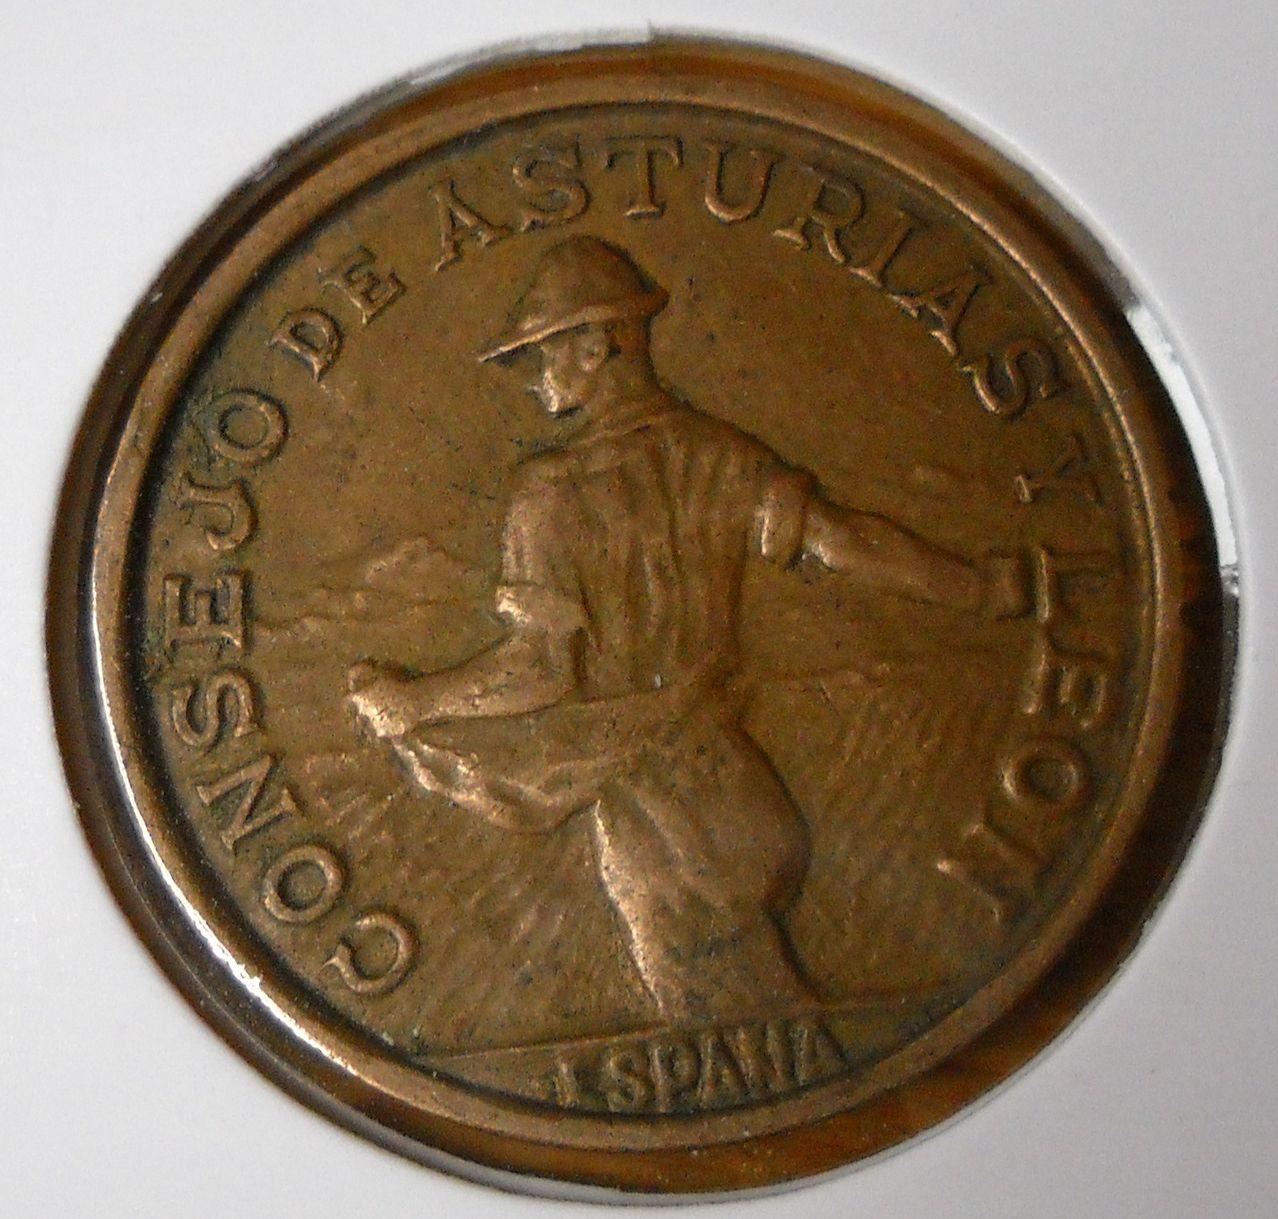 1 peseta 1937 Guerra Civil - Consejo de Asturias y Leon  DSCN0044